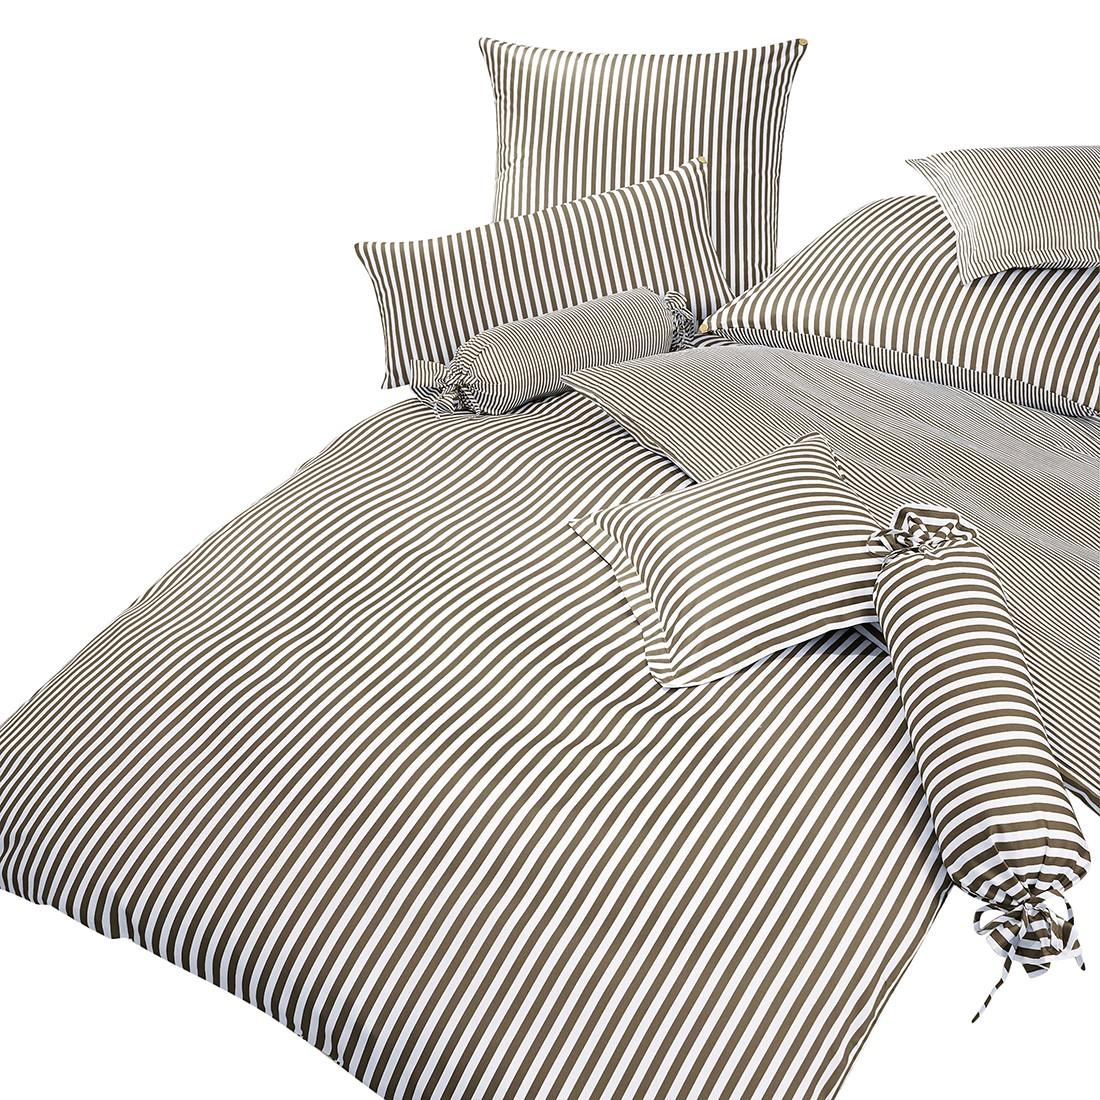 Home 24 - Taie d oreiller classic i - marron / blanc - 80 x 80 cm, janine